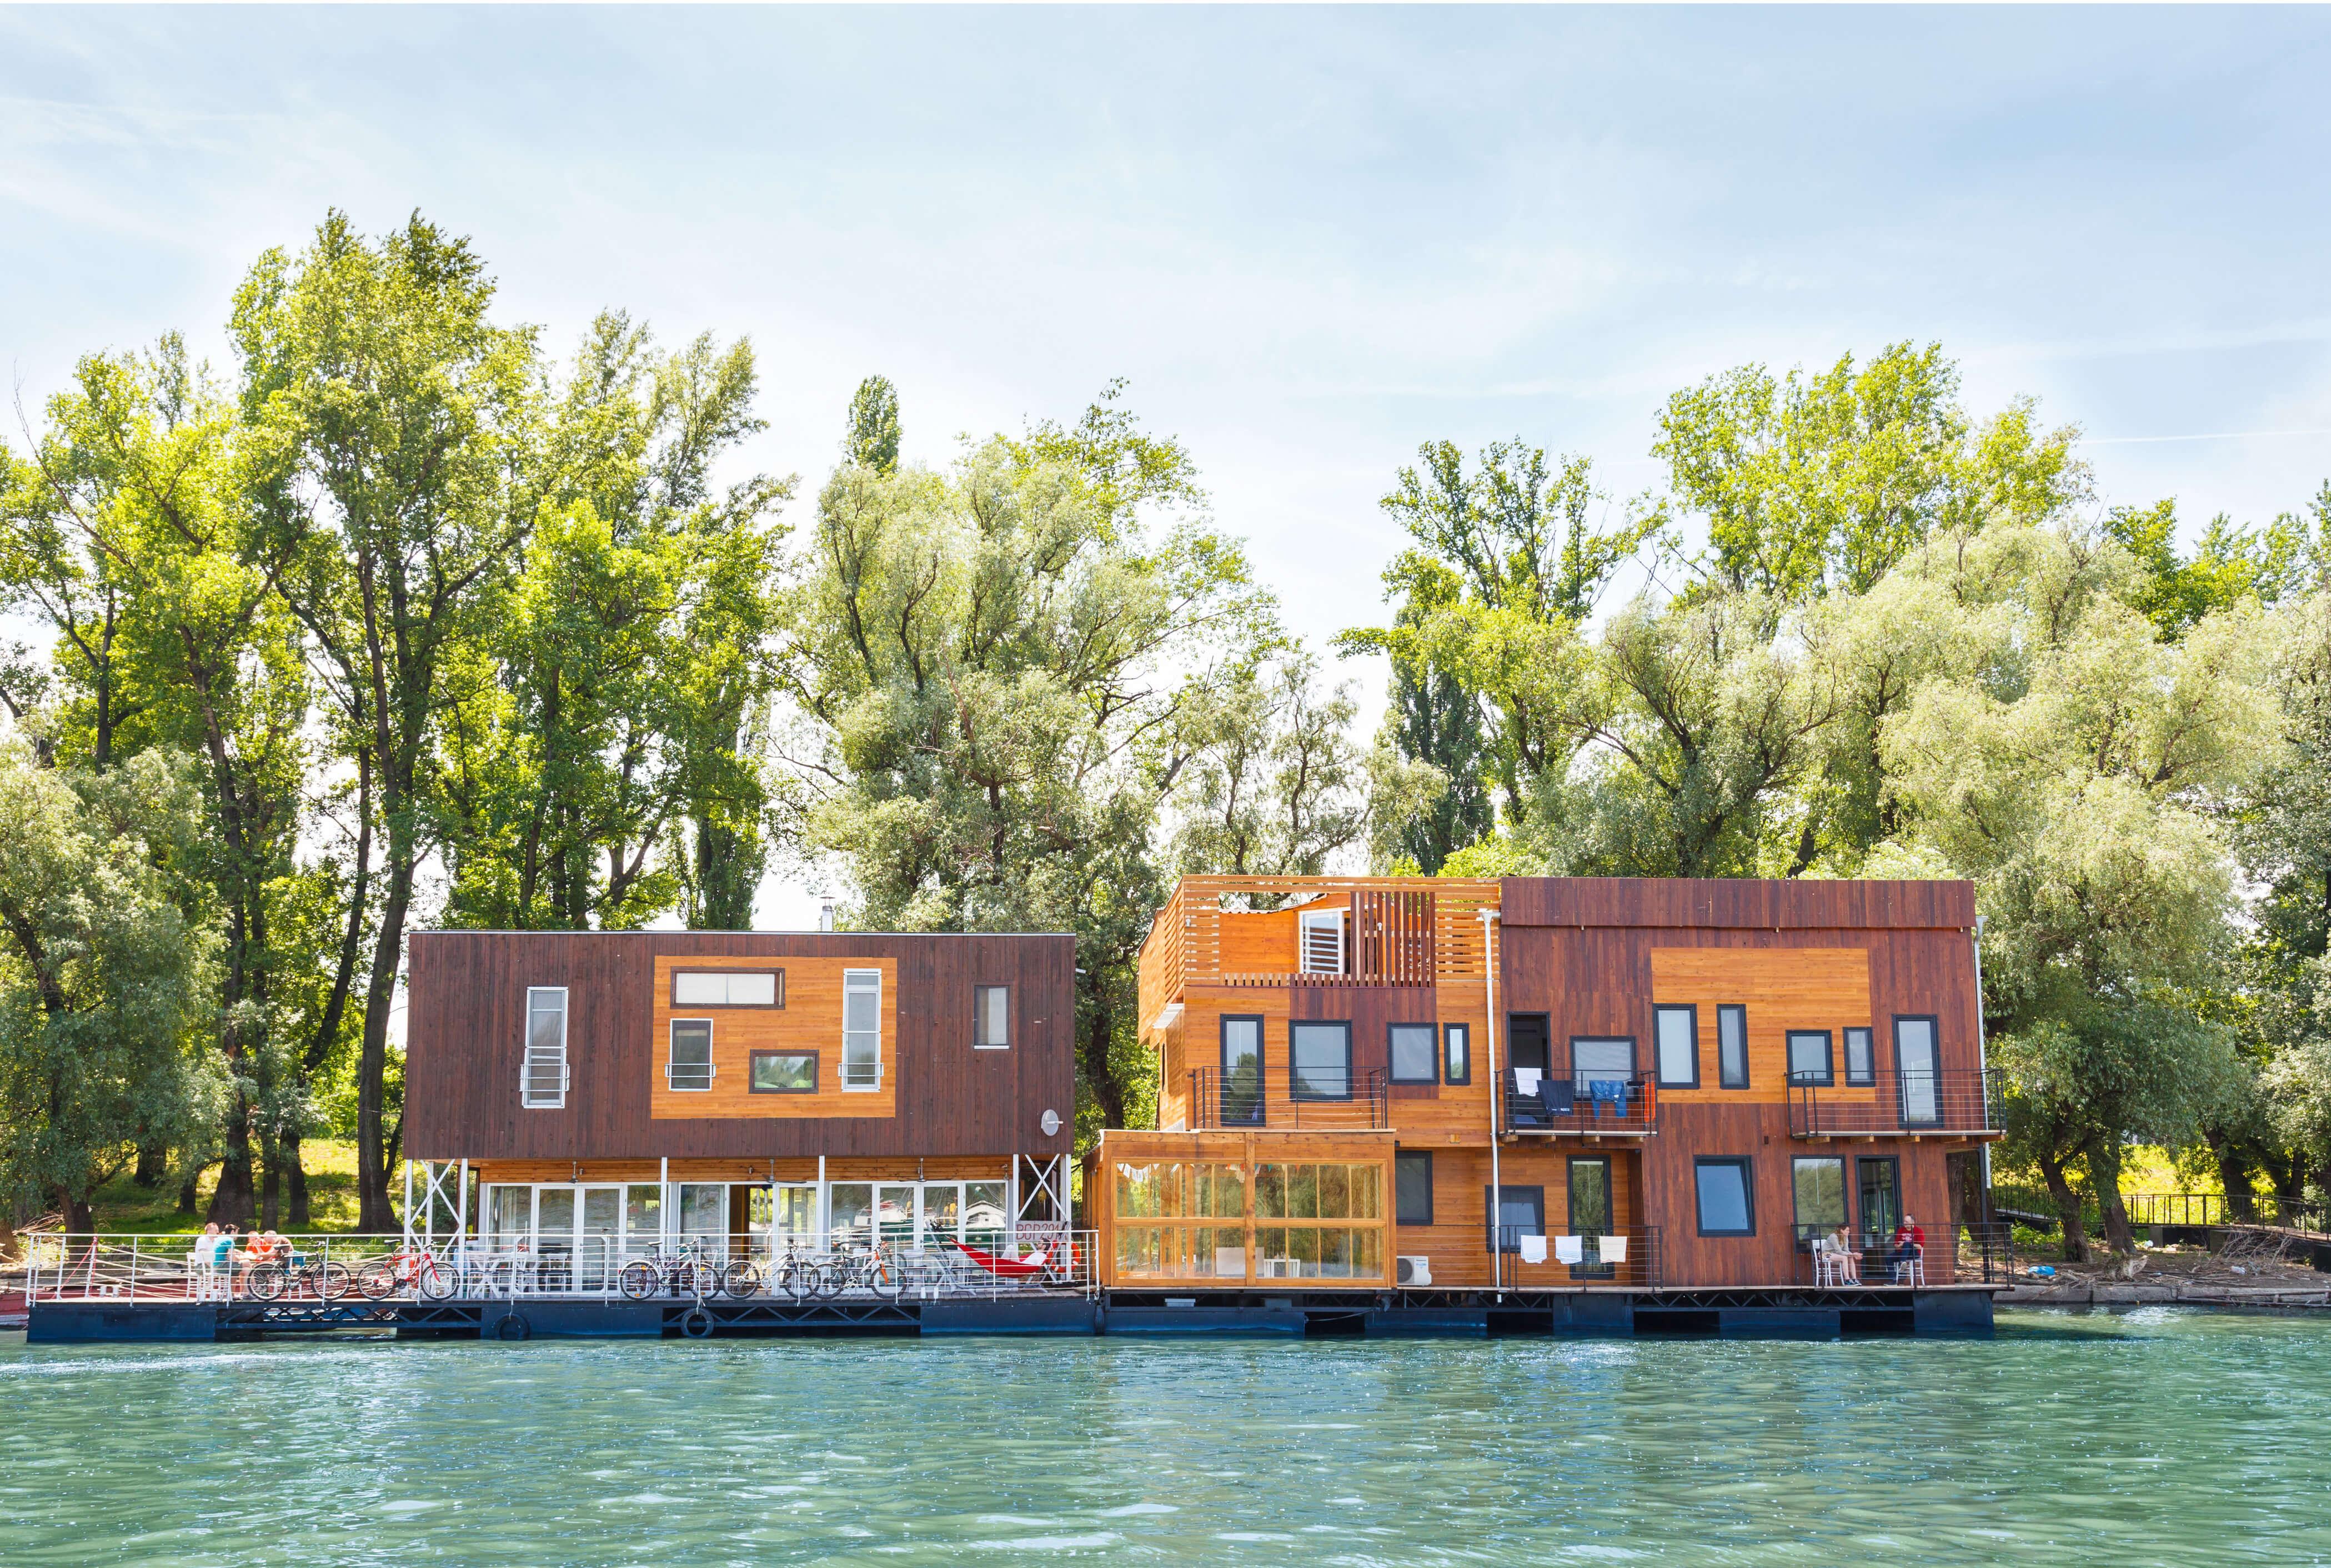 Hausboot in Belgrad Donau